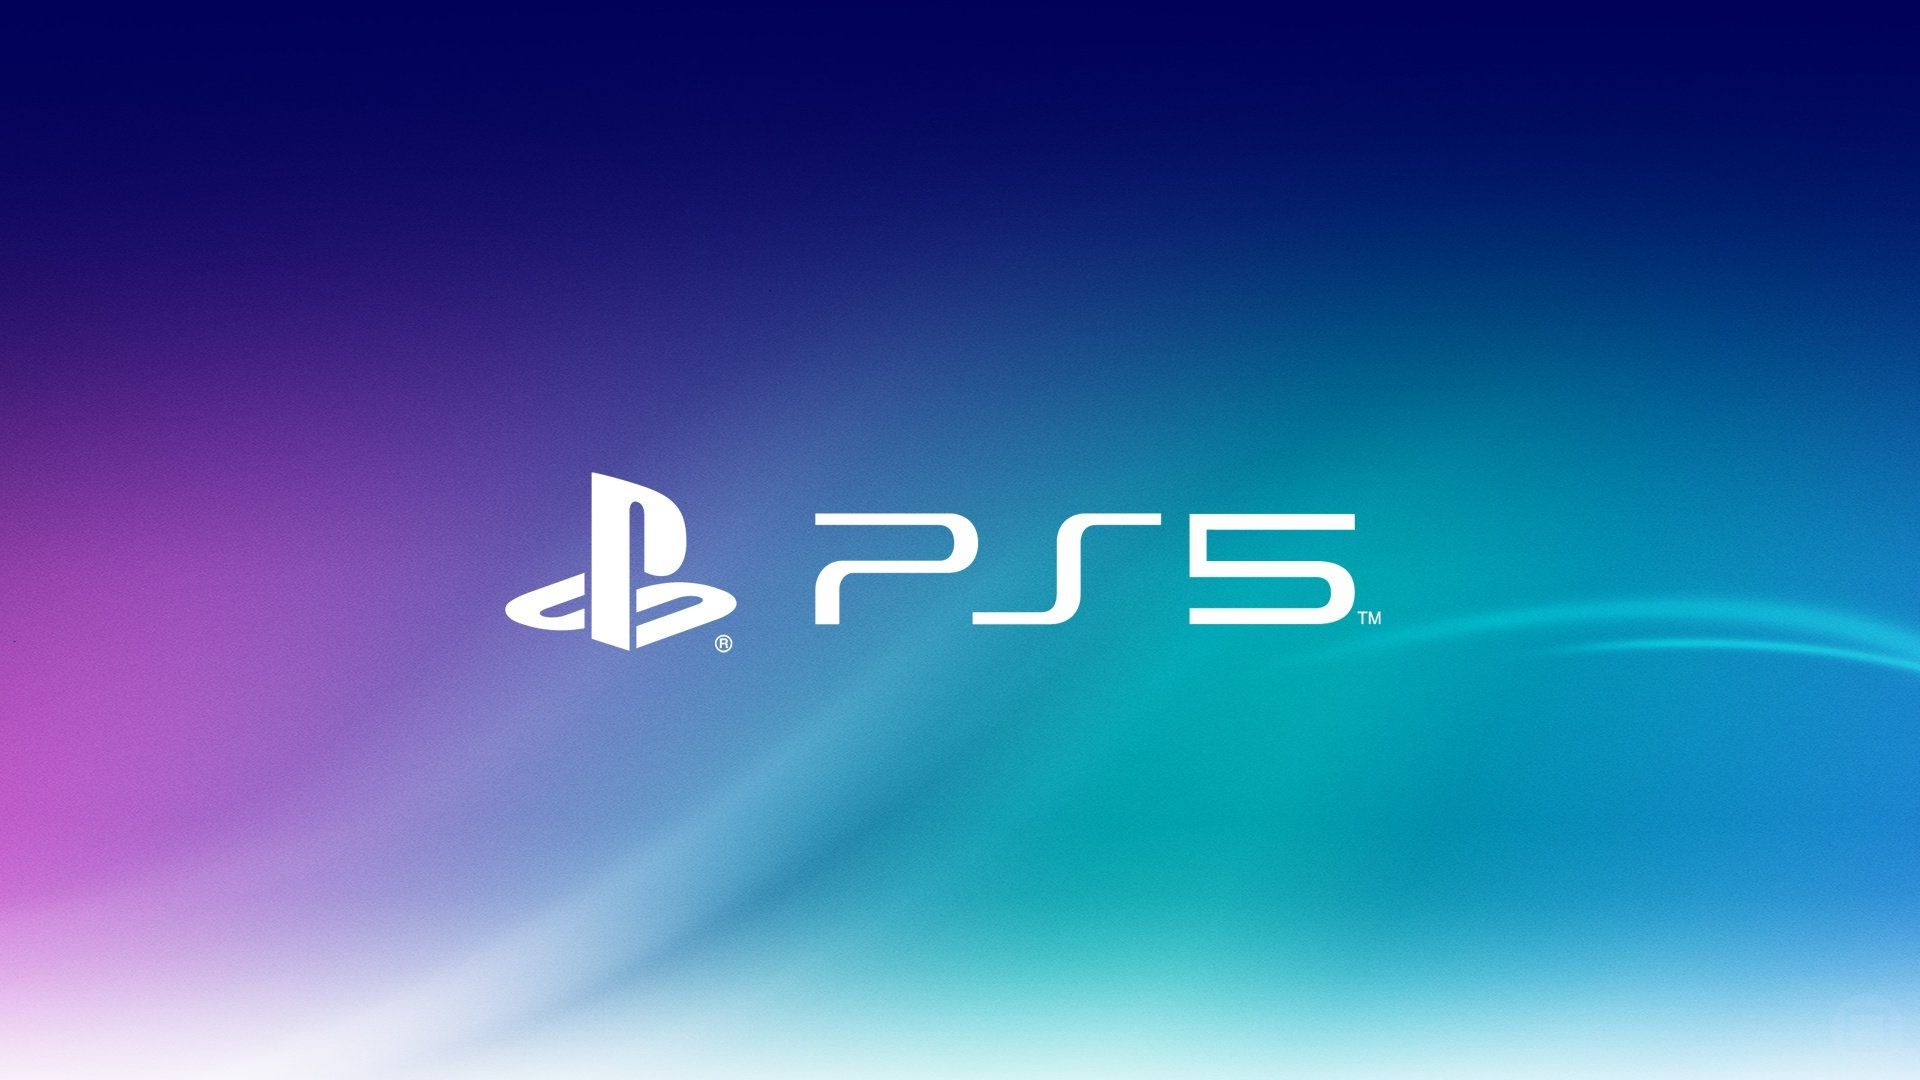 Playstation 5 PC Wallpaper